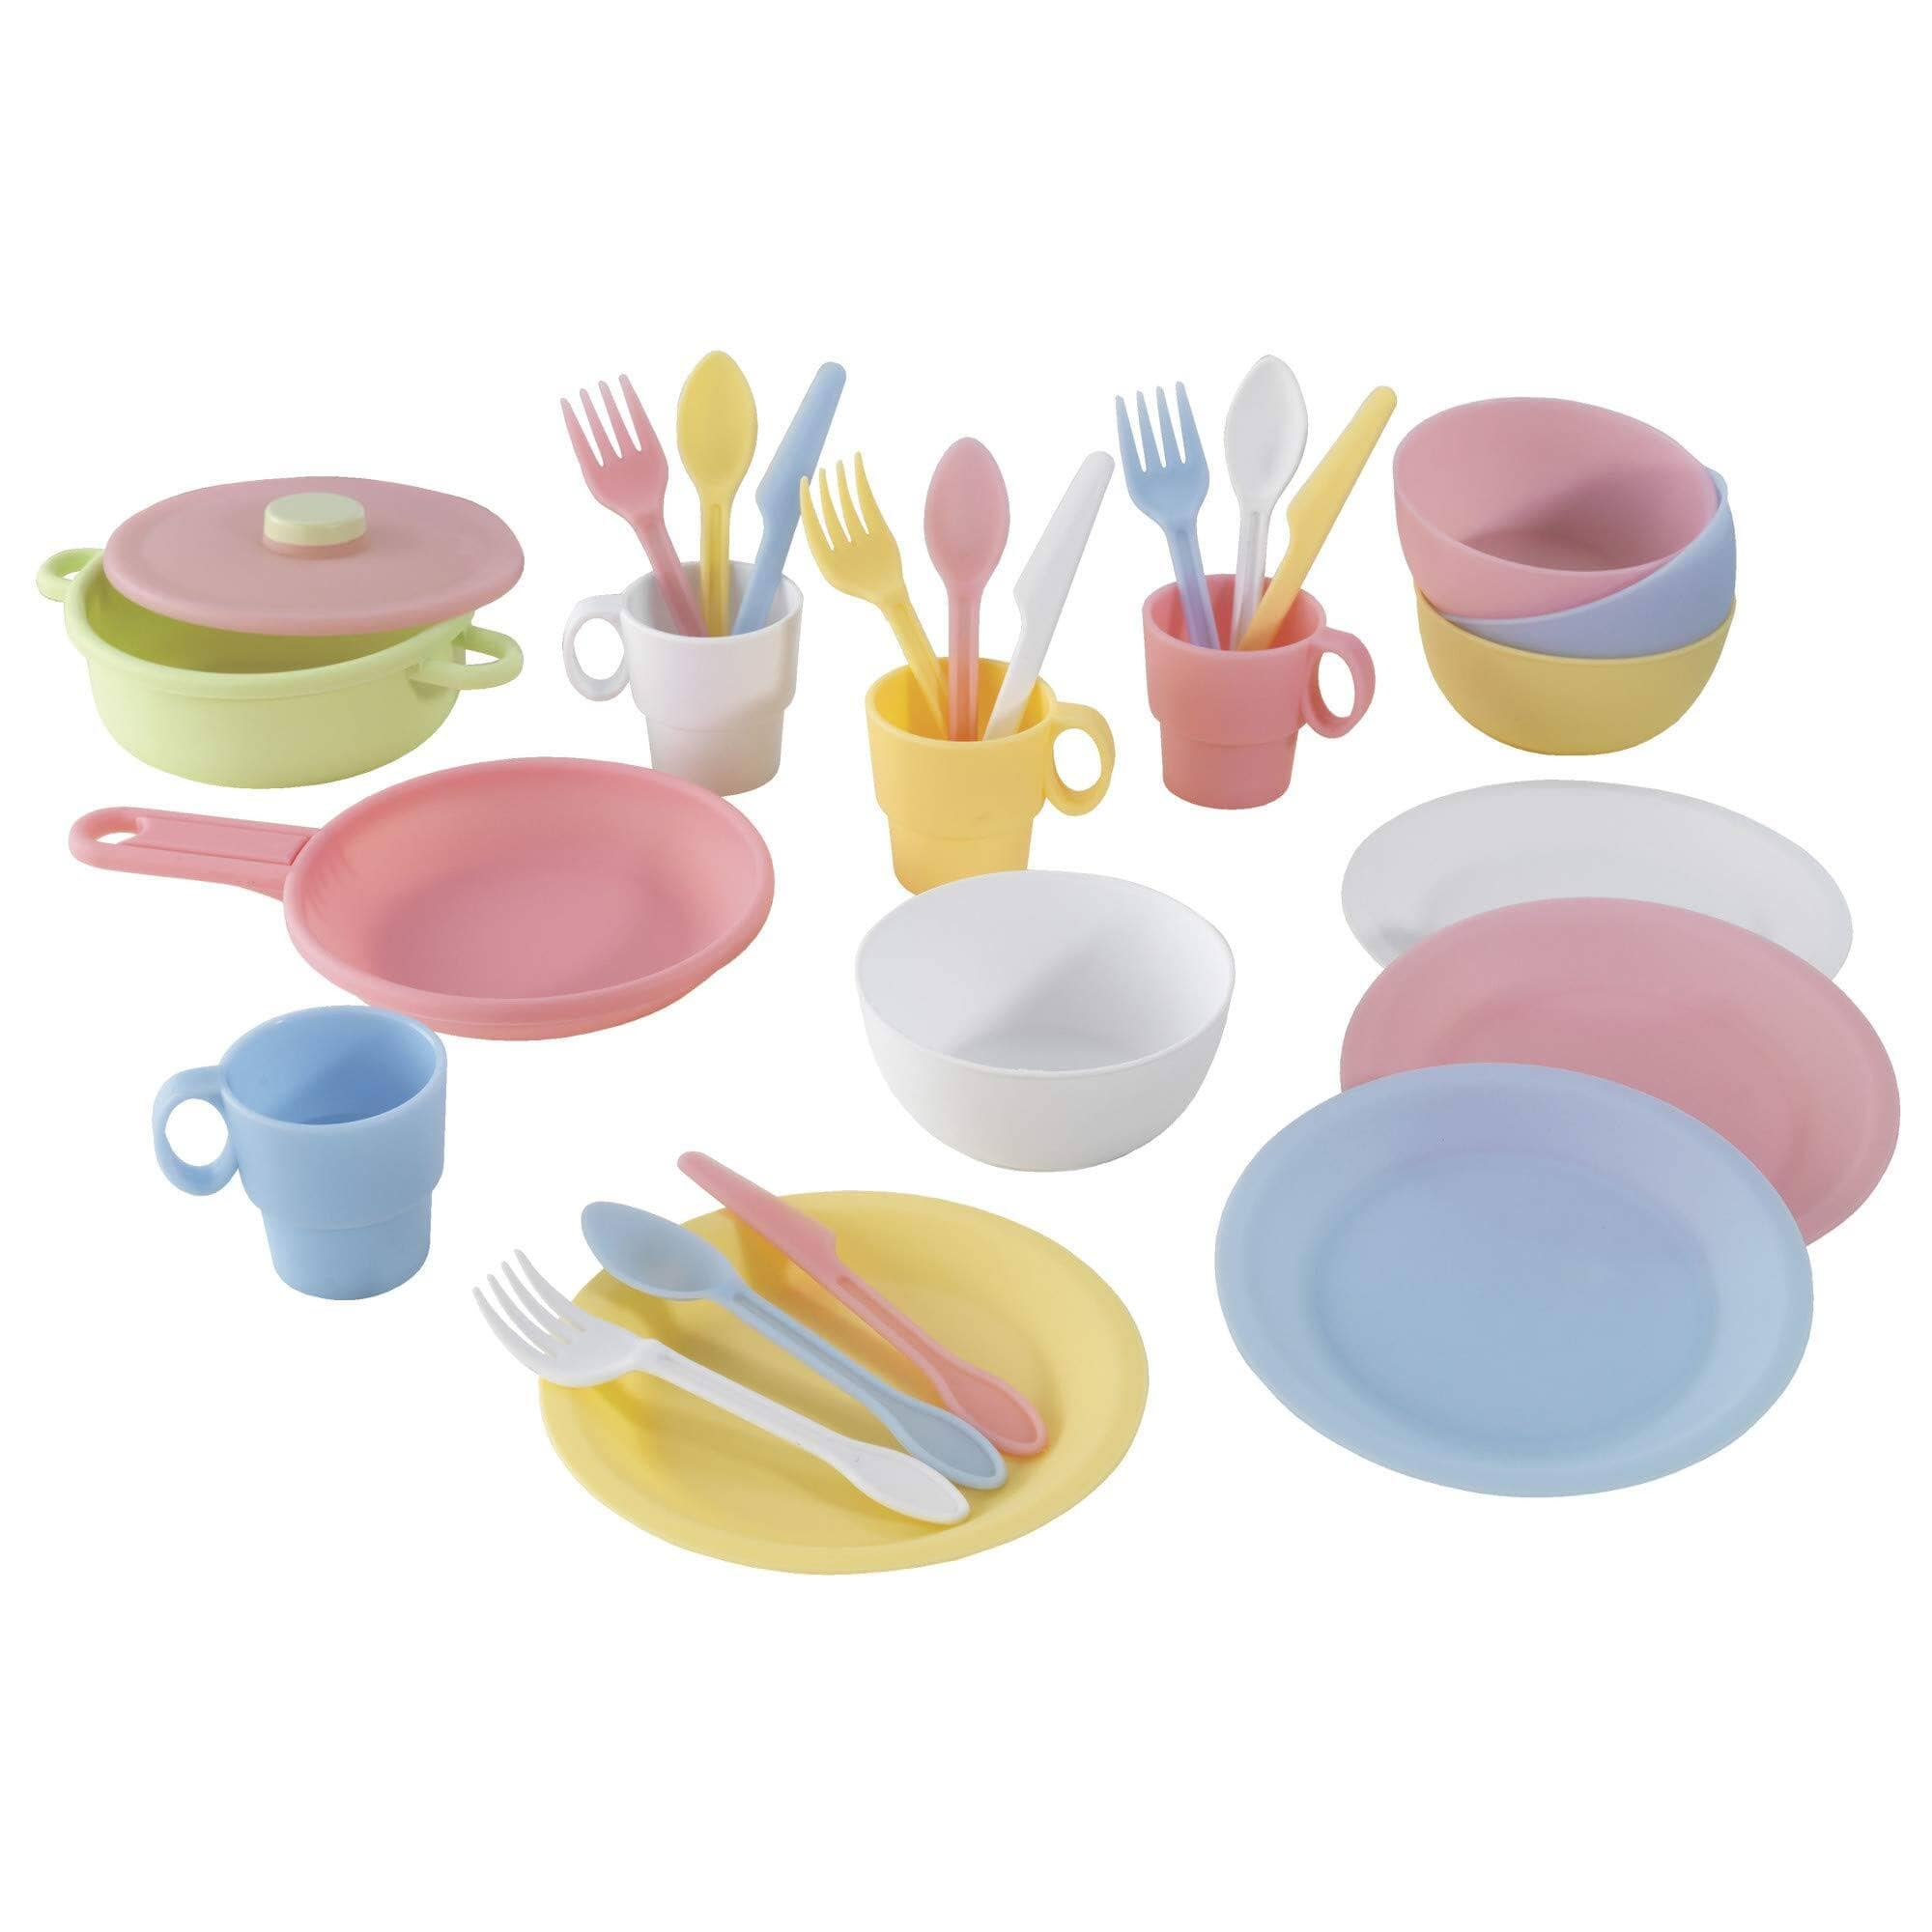 27-Piece Cookware KidKraft Playset (Pastel) $9.30 at Amazon / Walmart